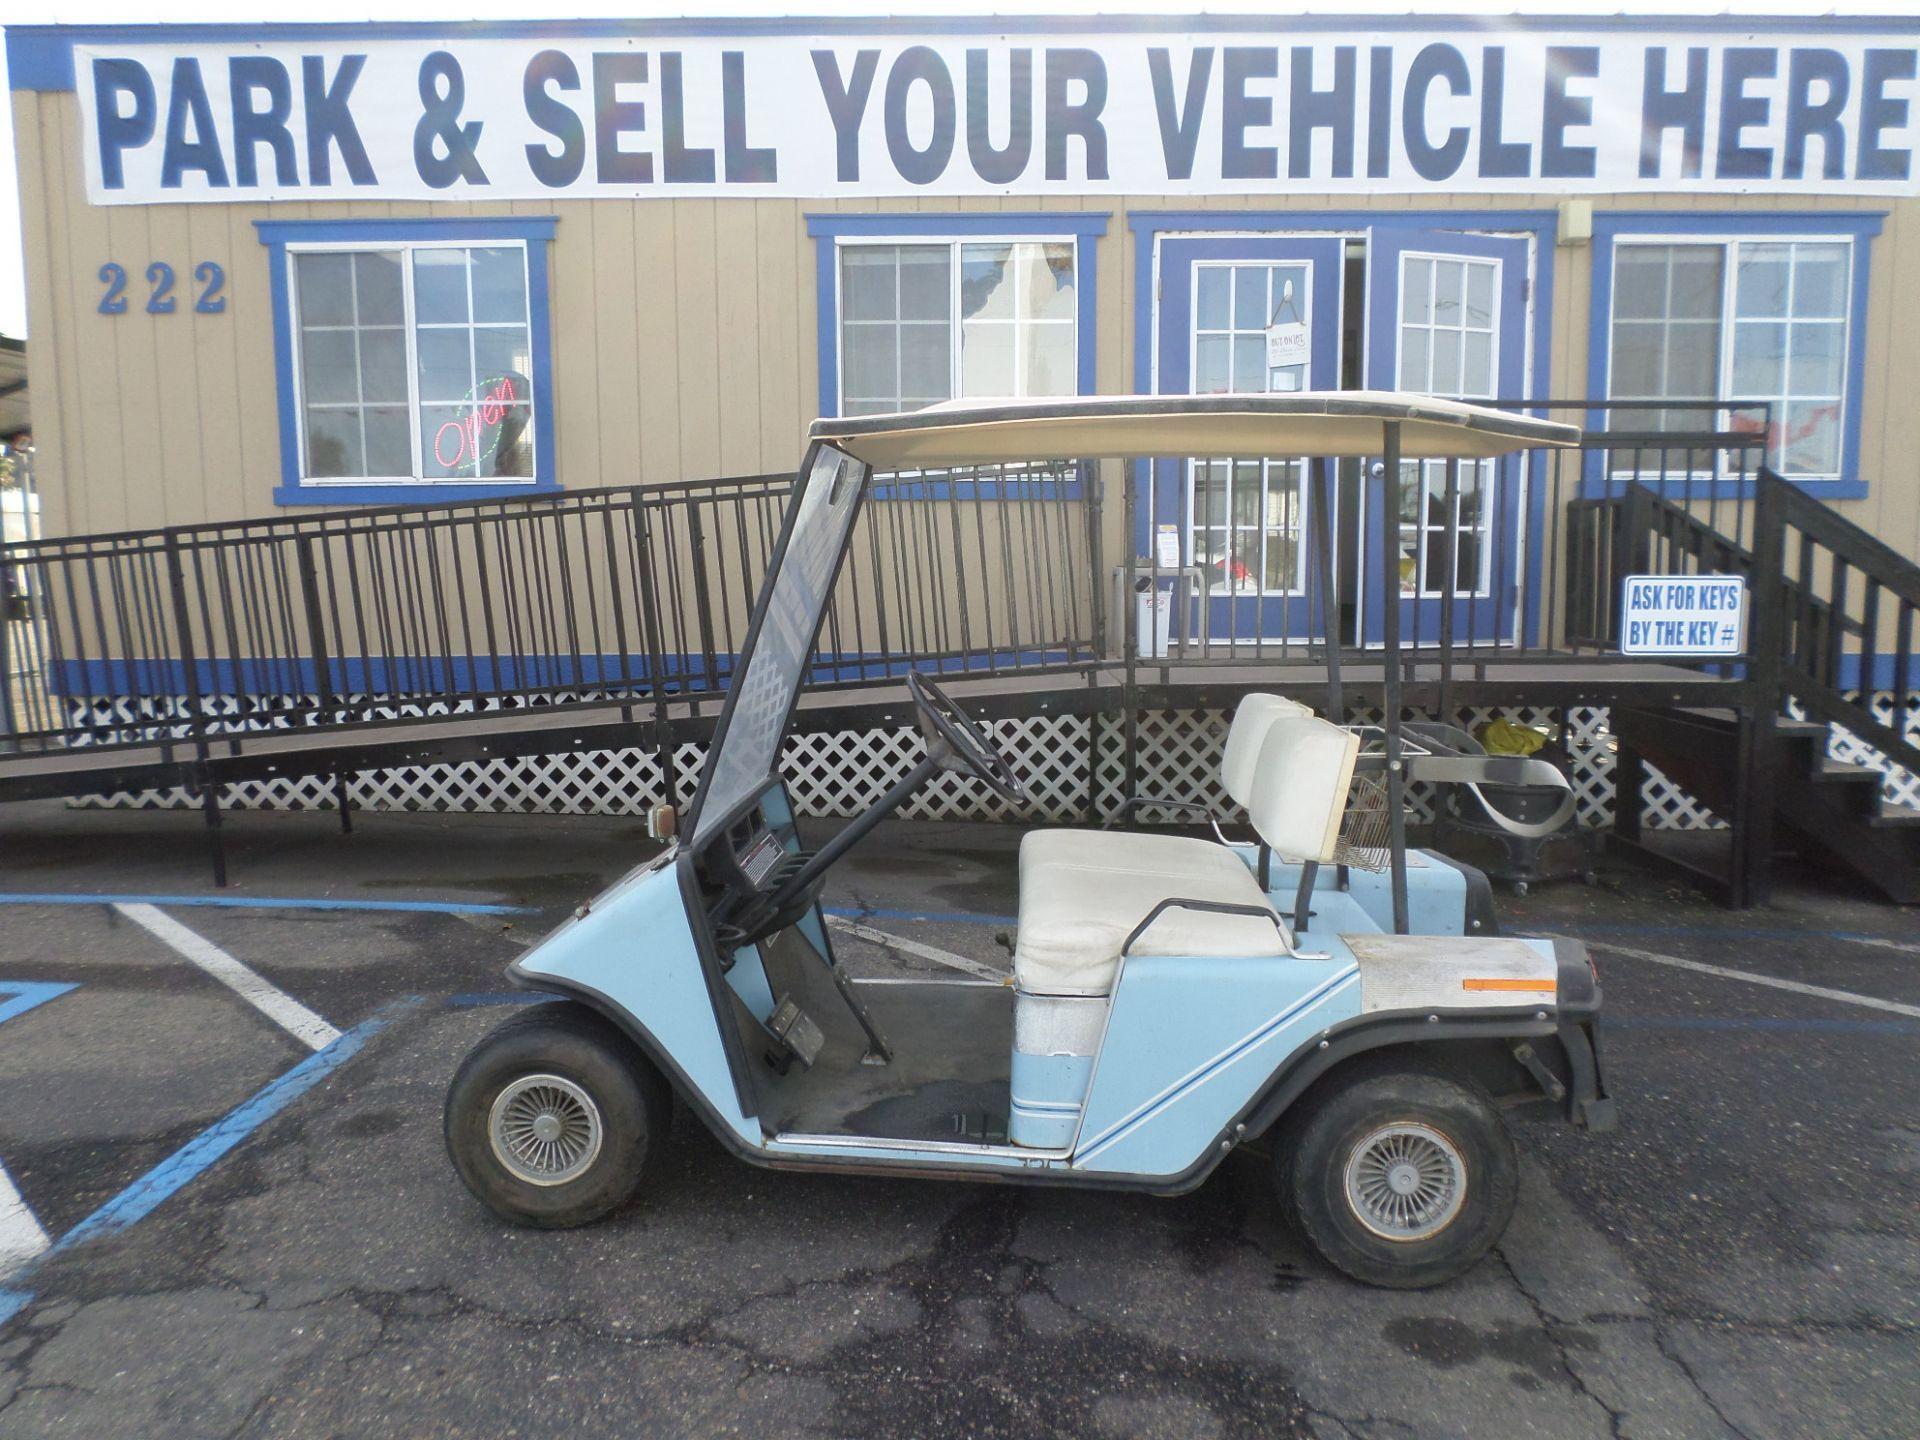 1987 EZ-GO Golf Cart   Cars   Golf carts, Golf carts for